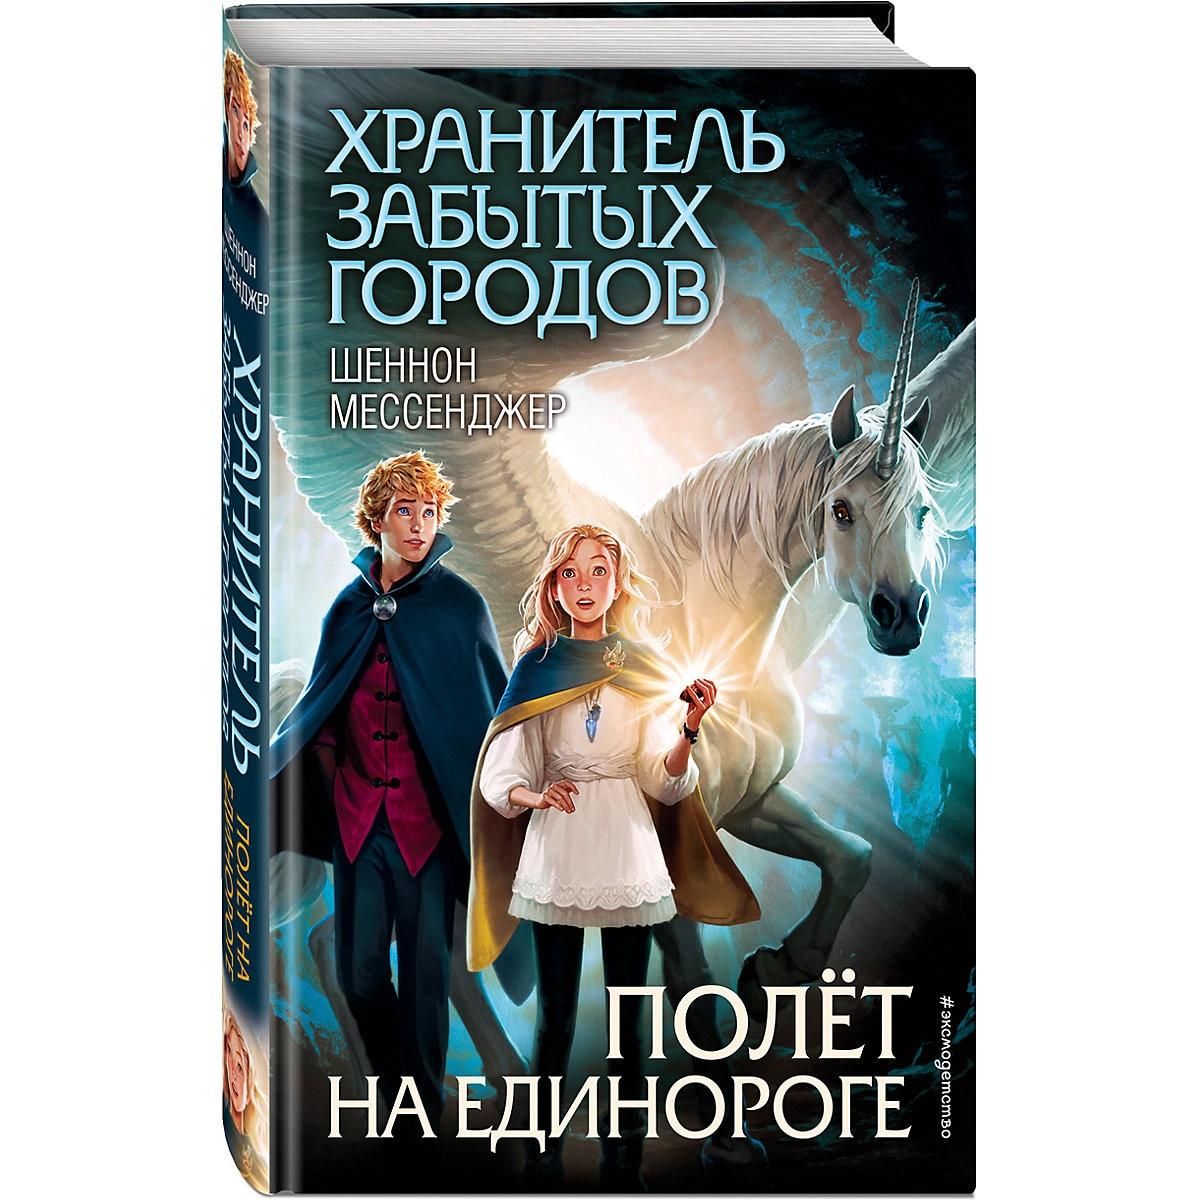 Books EKSMO 10757981 Children Education Encyclopedia Alphabet Dictionary Book For Baby MTpromo